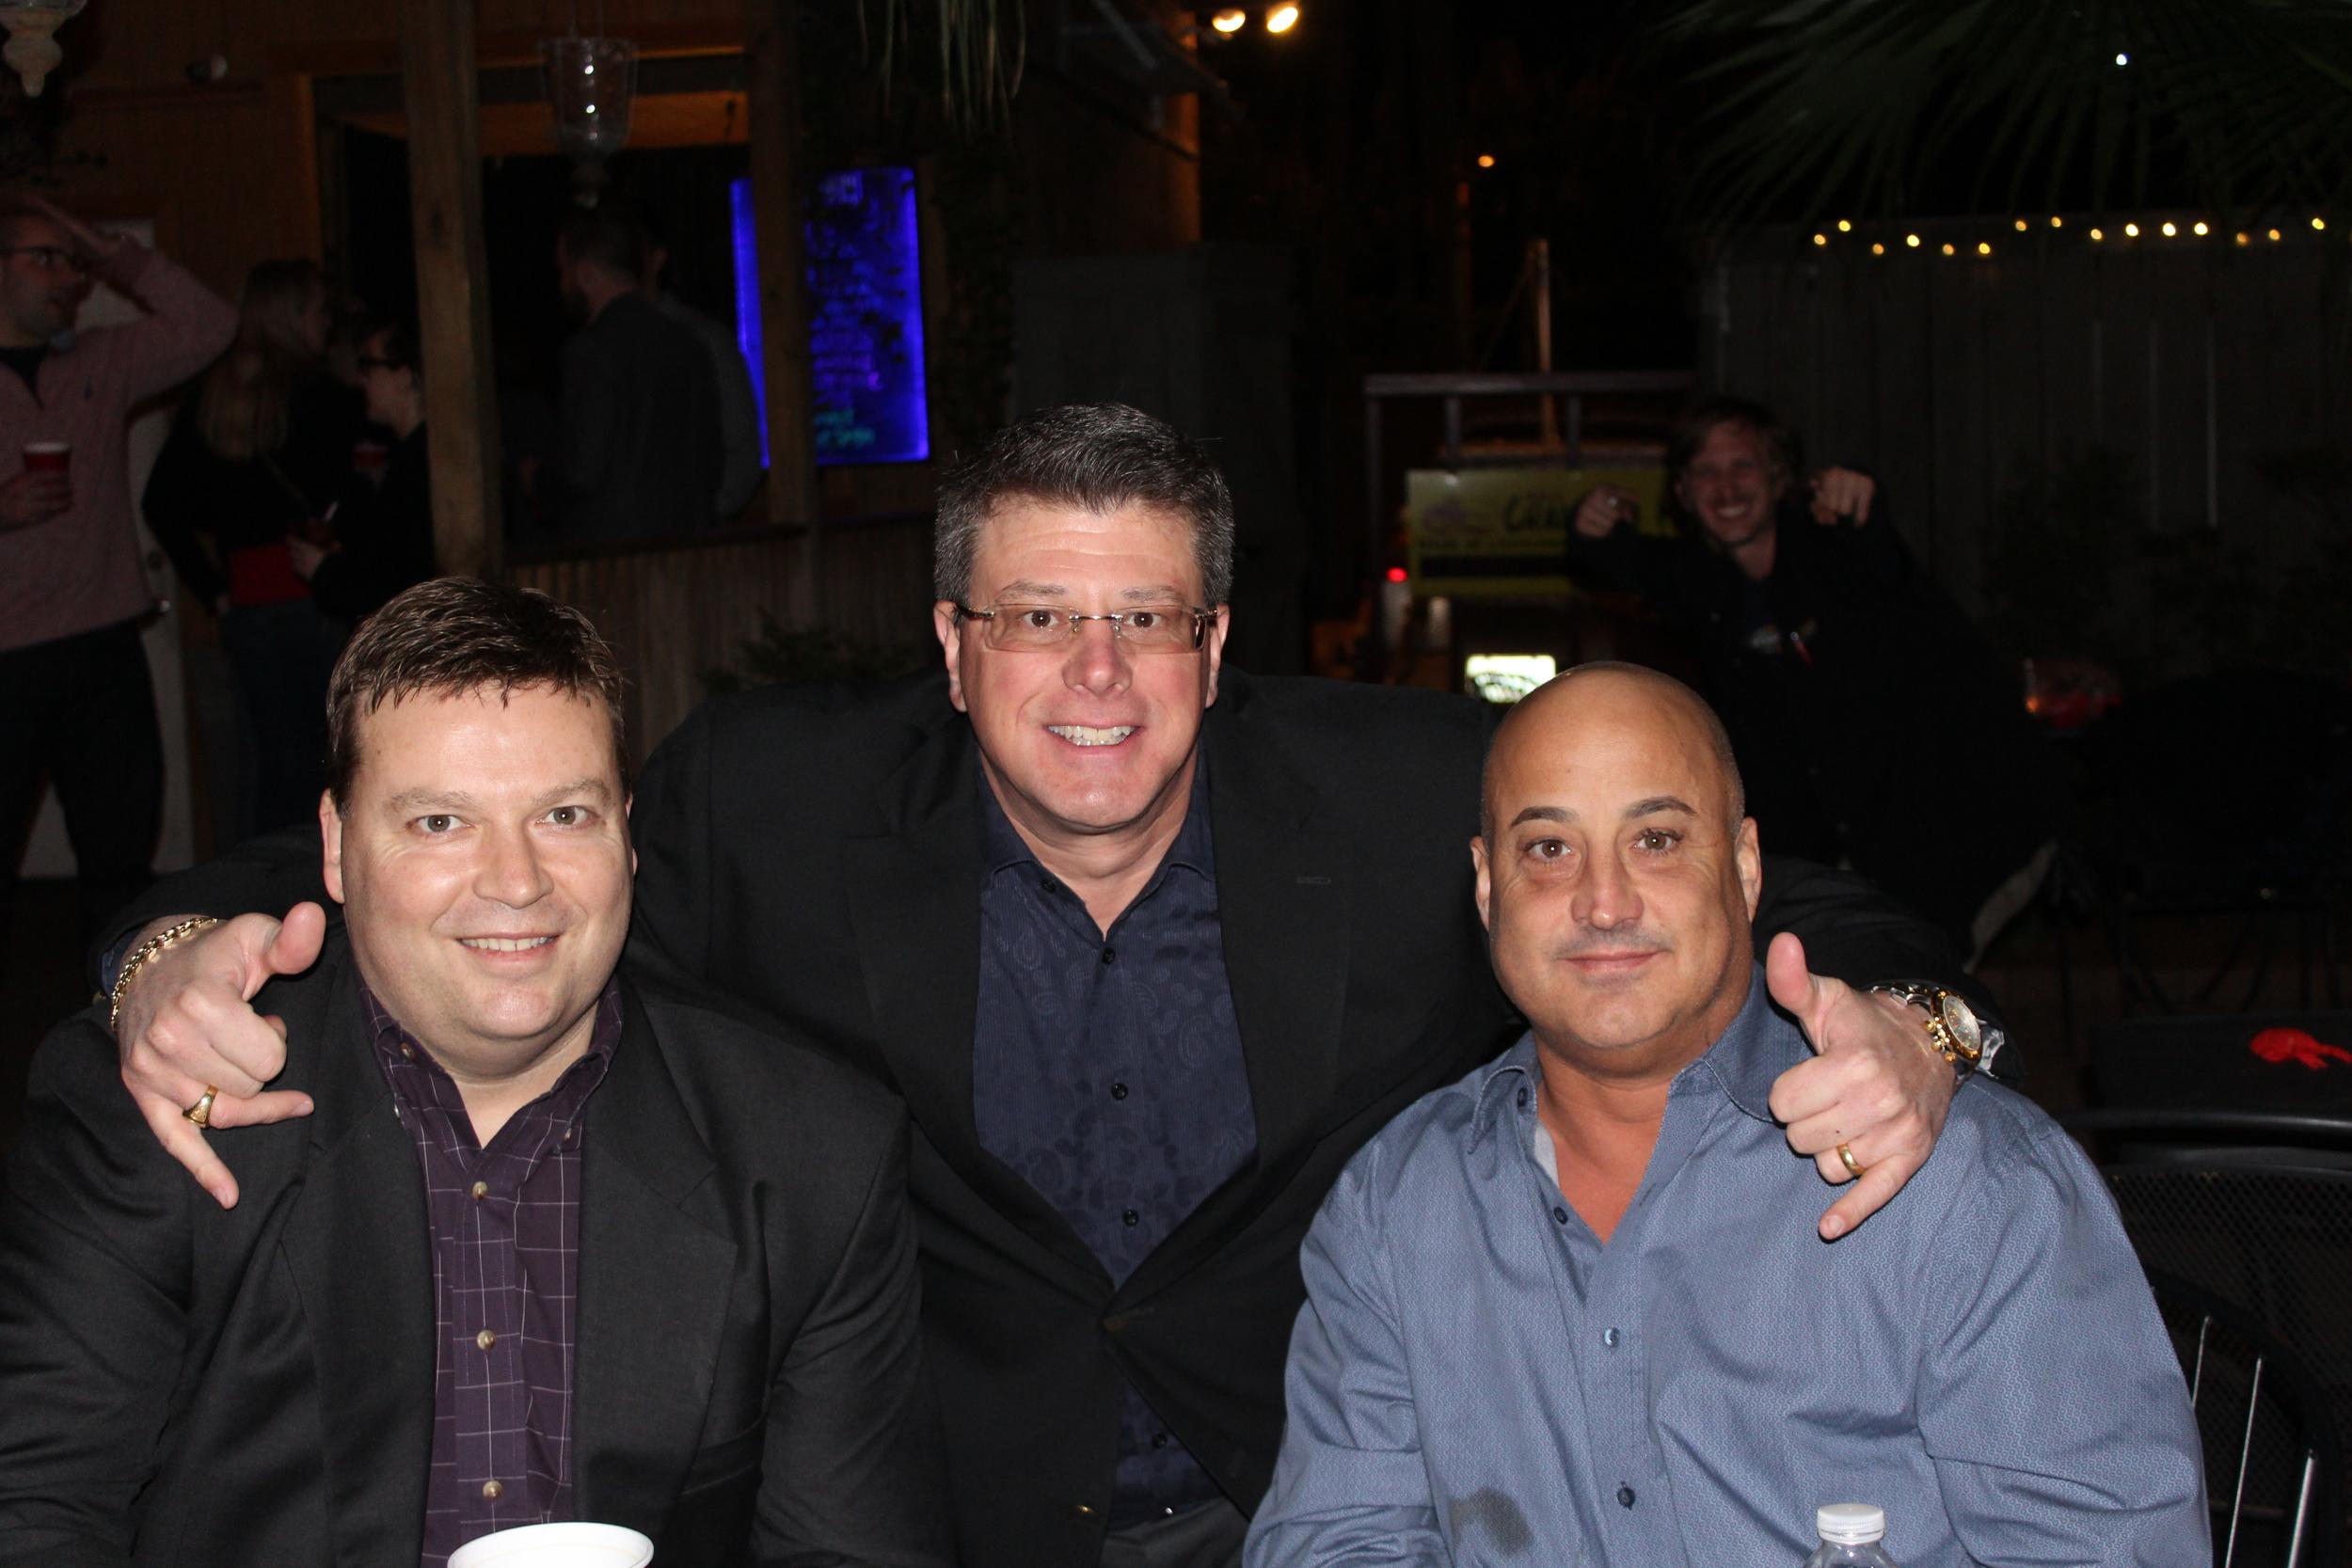 Updater's Michael Clarner, alongside Arpin's Marco Uriati and Richard Travisono